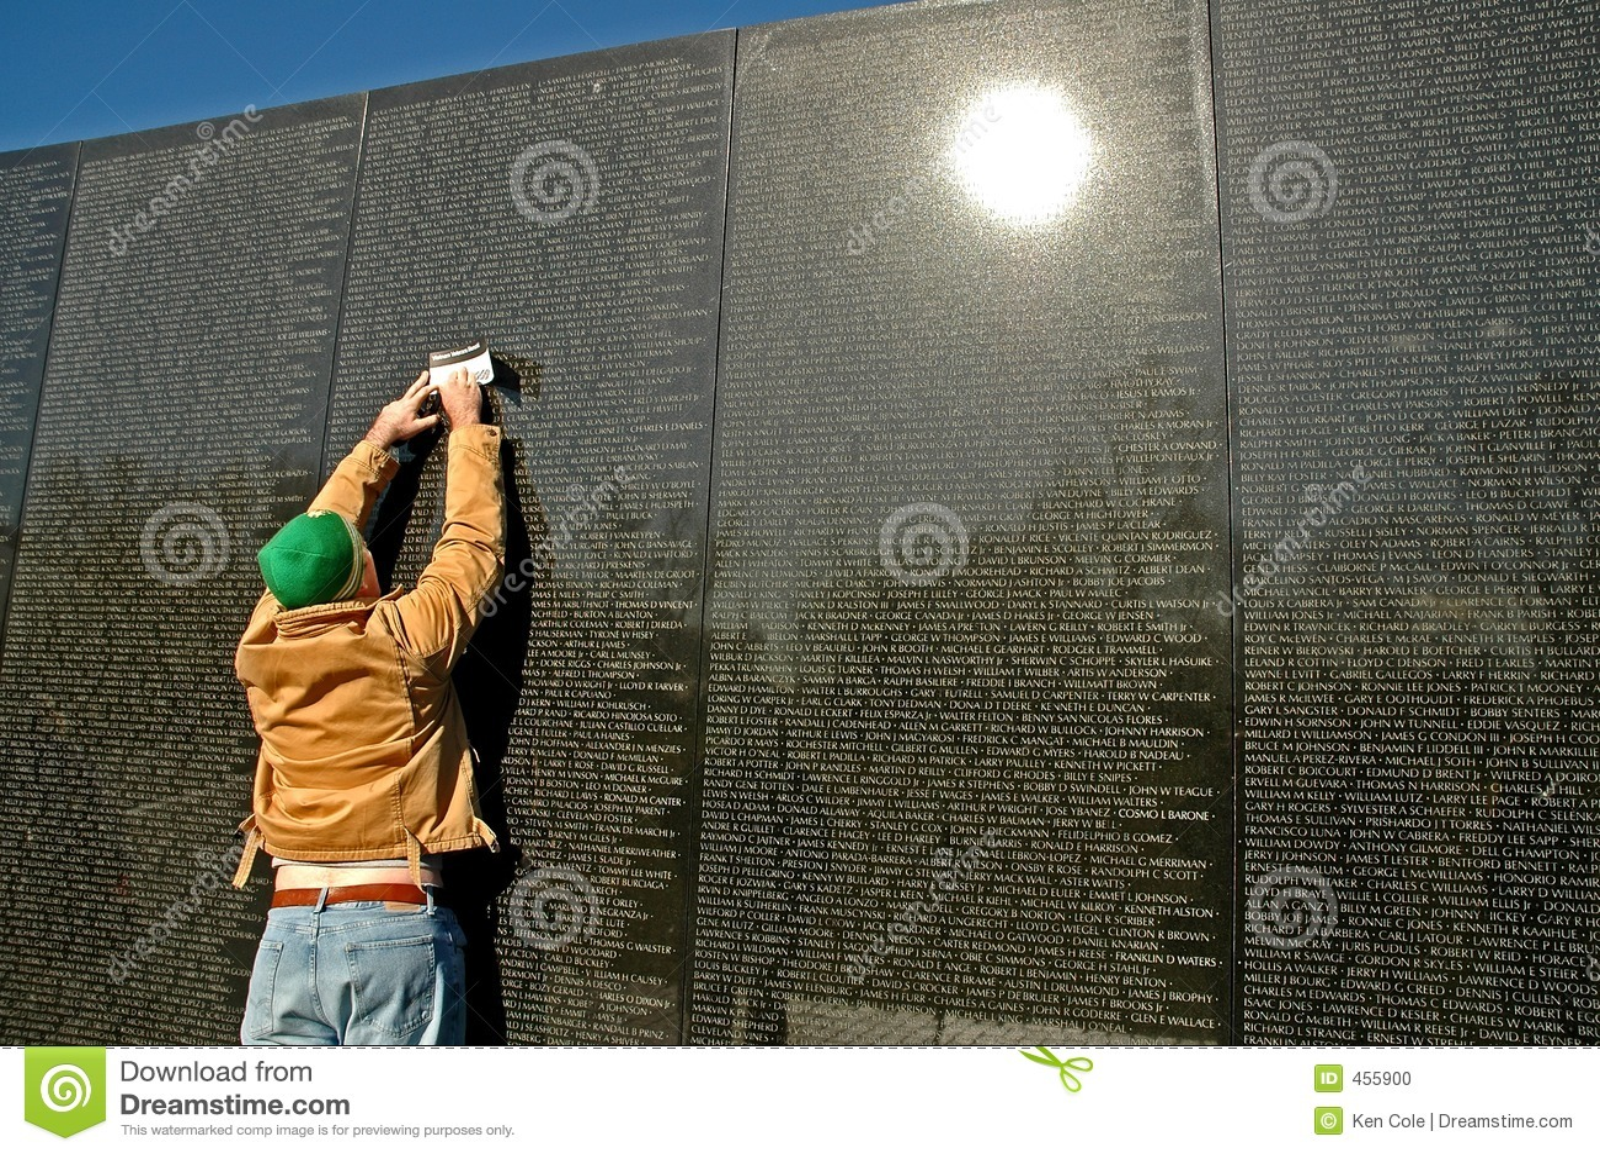 Vietnam Memorial Wall Rubbing